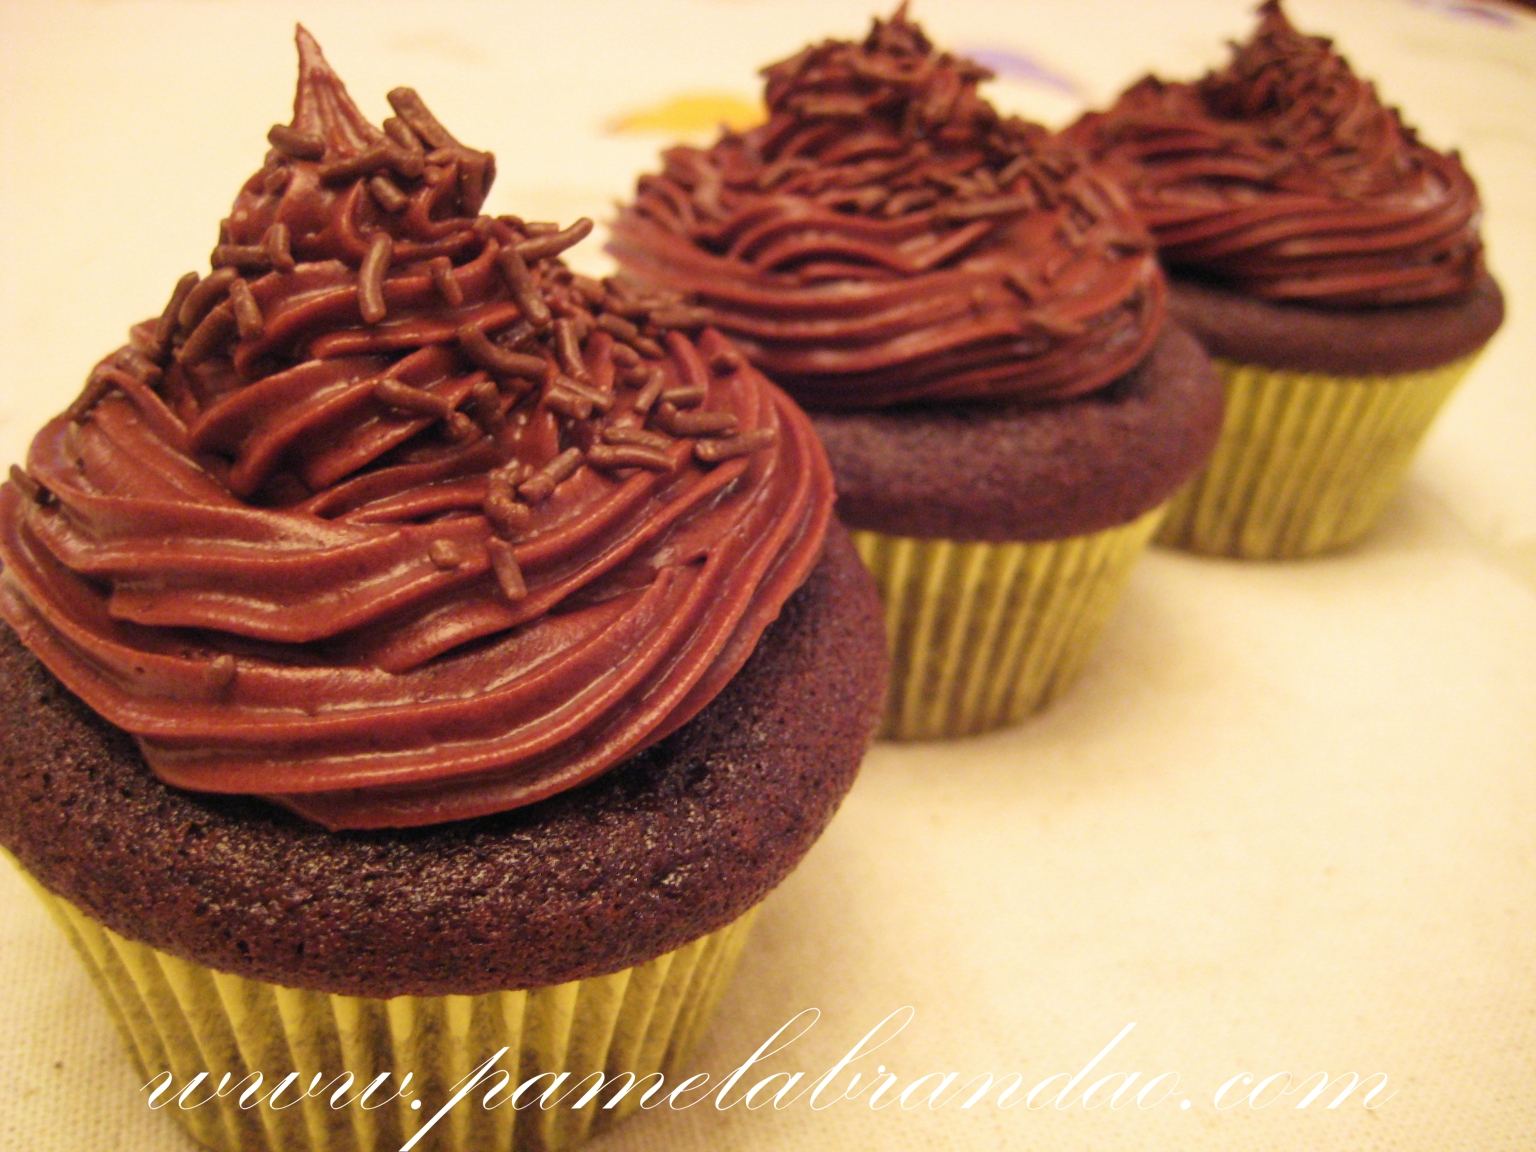 Fun Friends and Cupcakes Receita do Cupcake de Chocolate  : cupcake chocolate buttercream from funfriendsandcupcakes.blogspot.com size 1536 x 1152 jpeg 1272kB